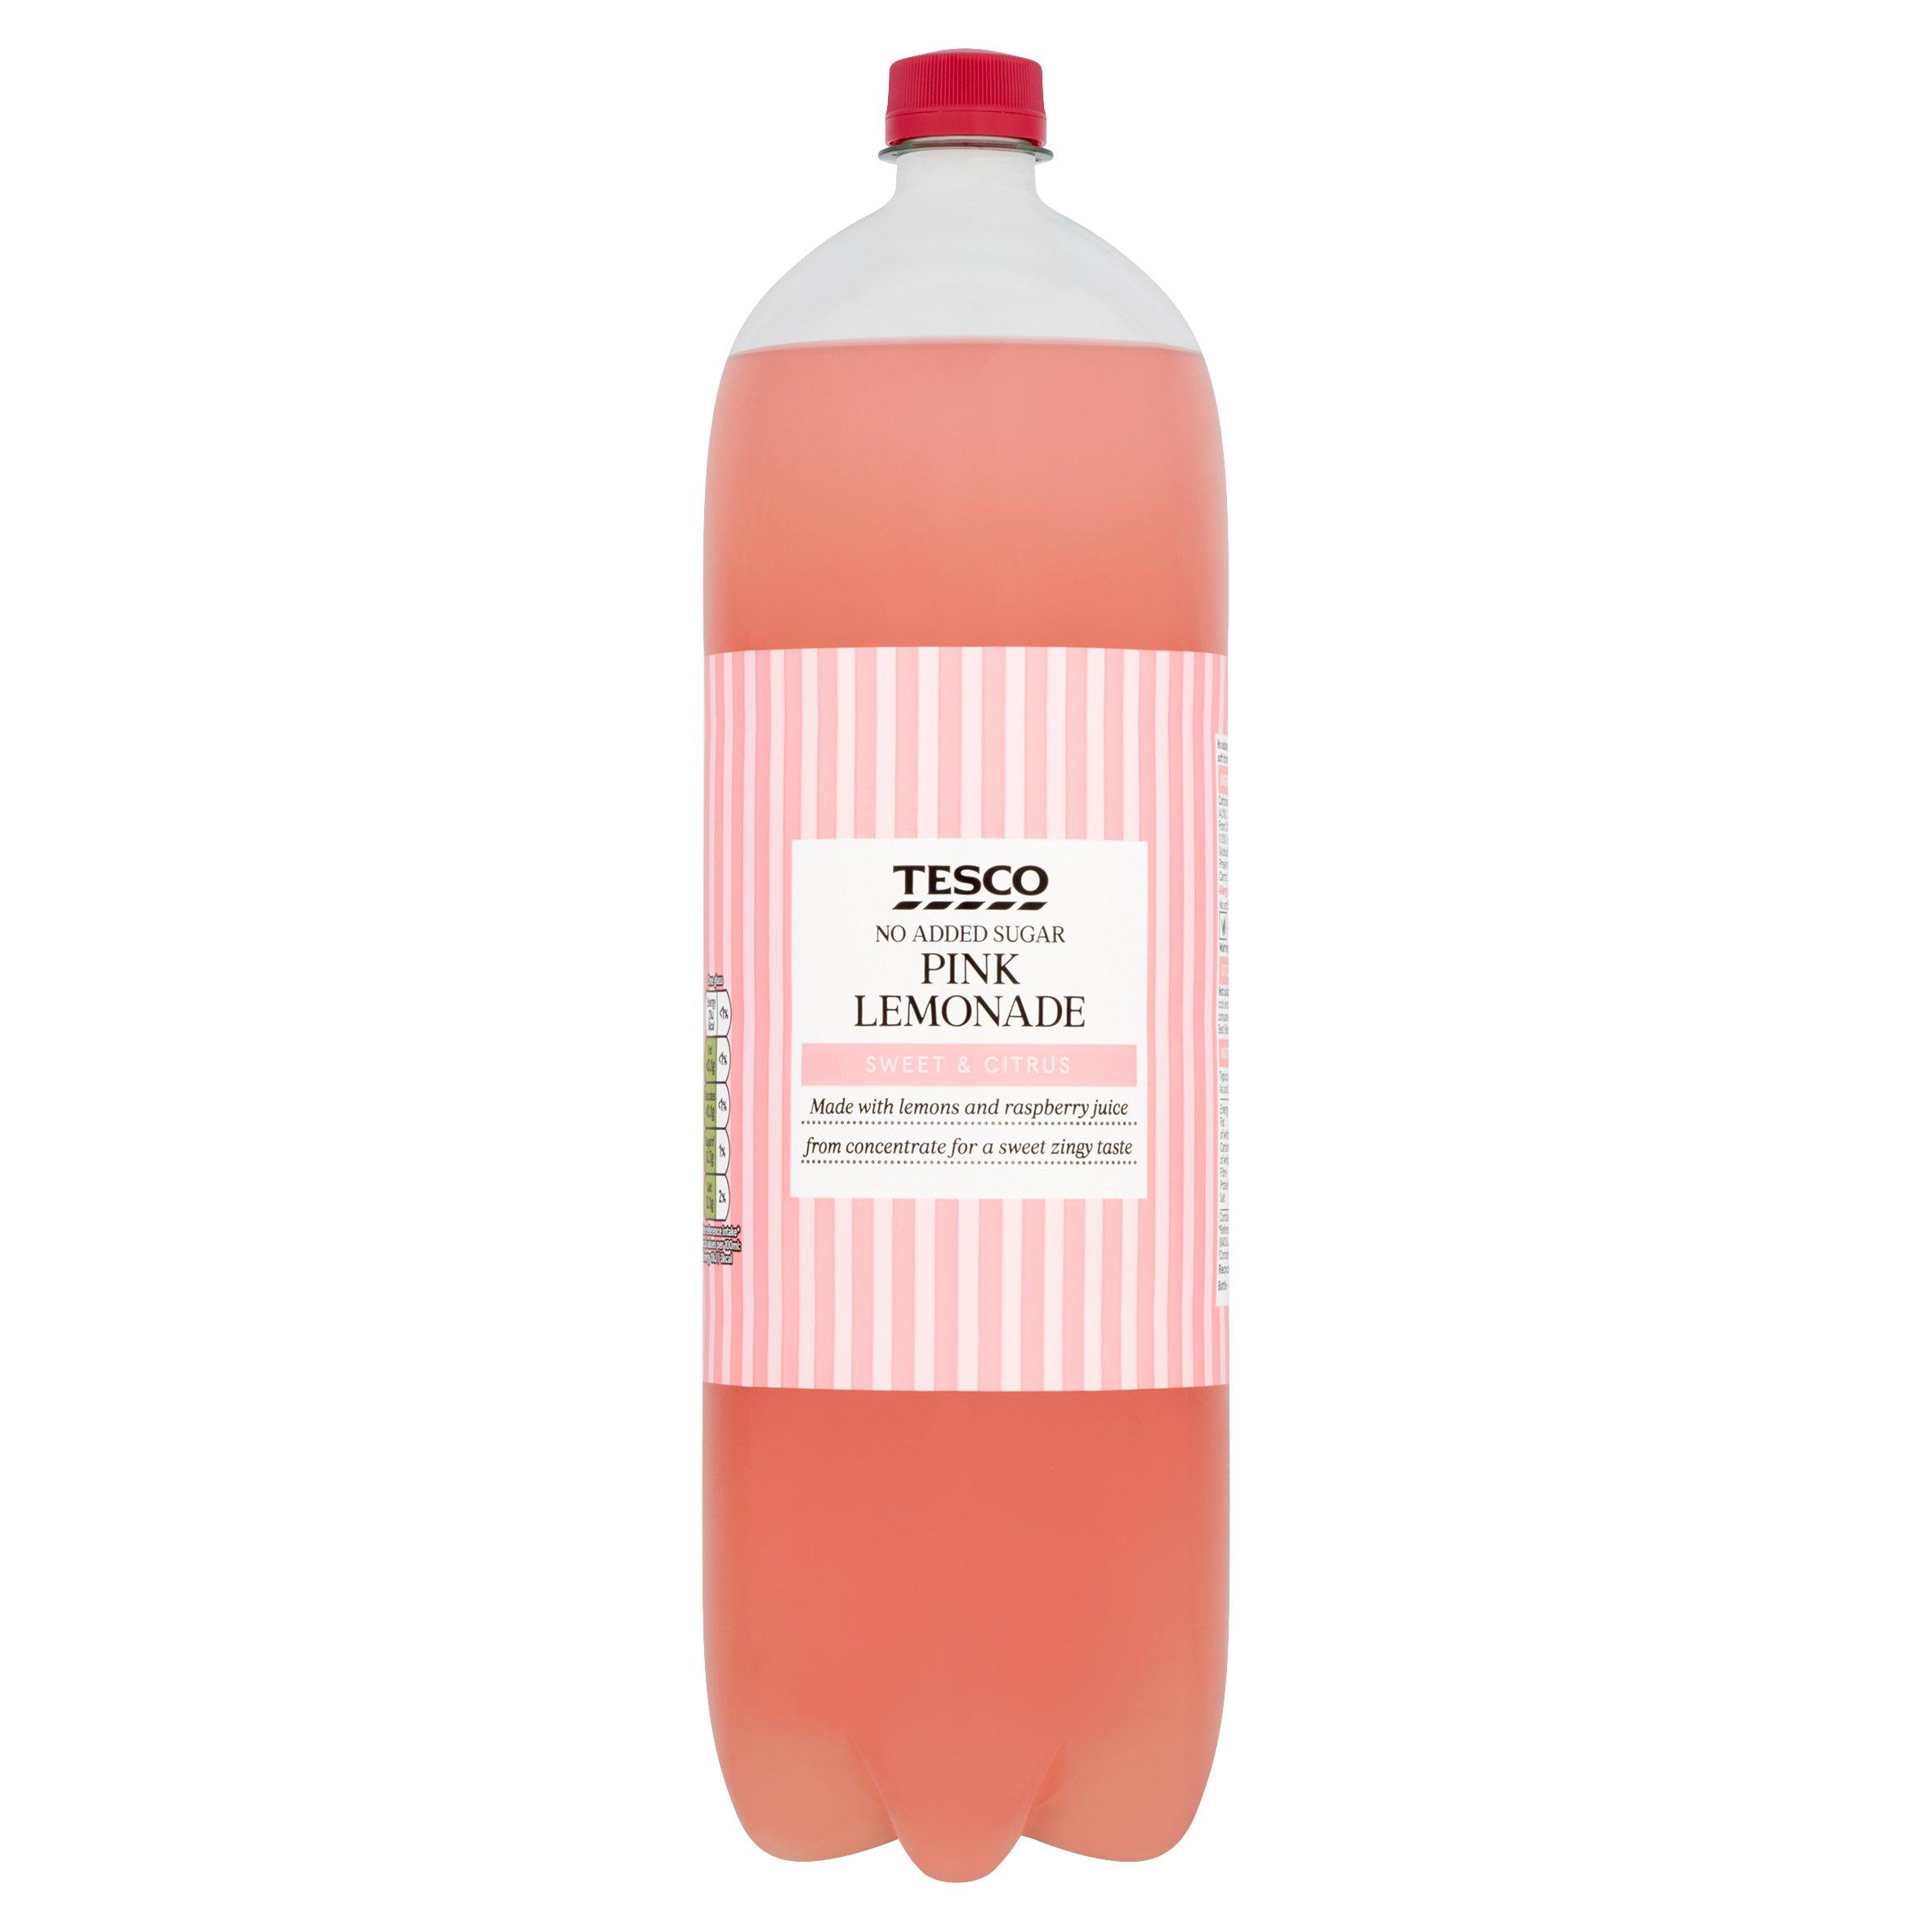 Tesco No Added Sugar Pink Lemonade 2L